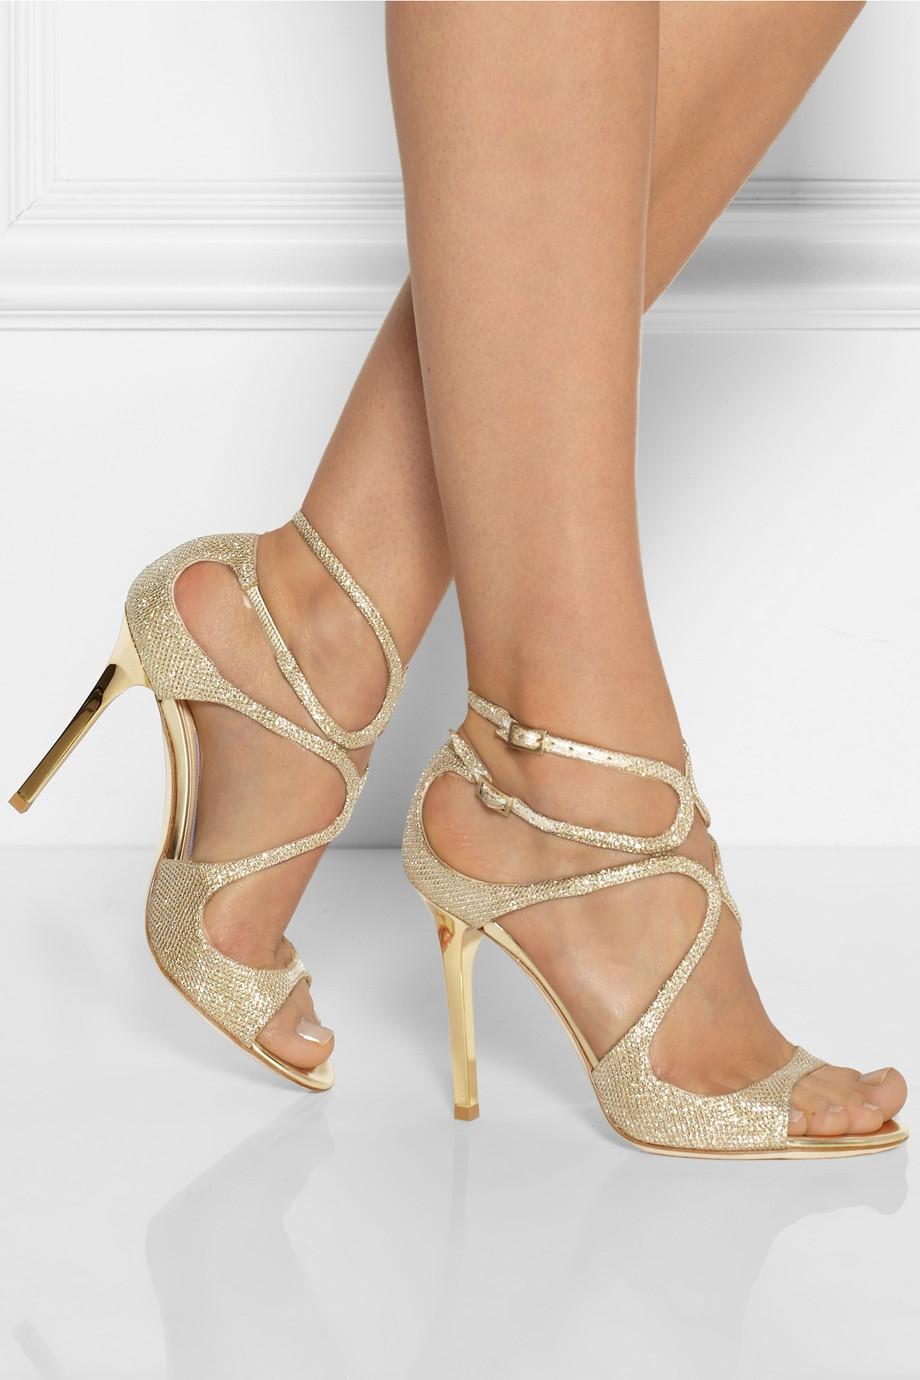 e4f2f8a08efb Lyst - Jimmy Choo Lang Textured-lamé Sandals in Metallic